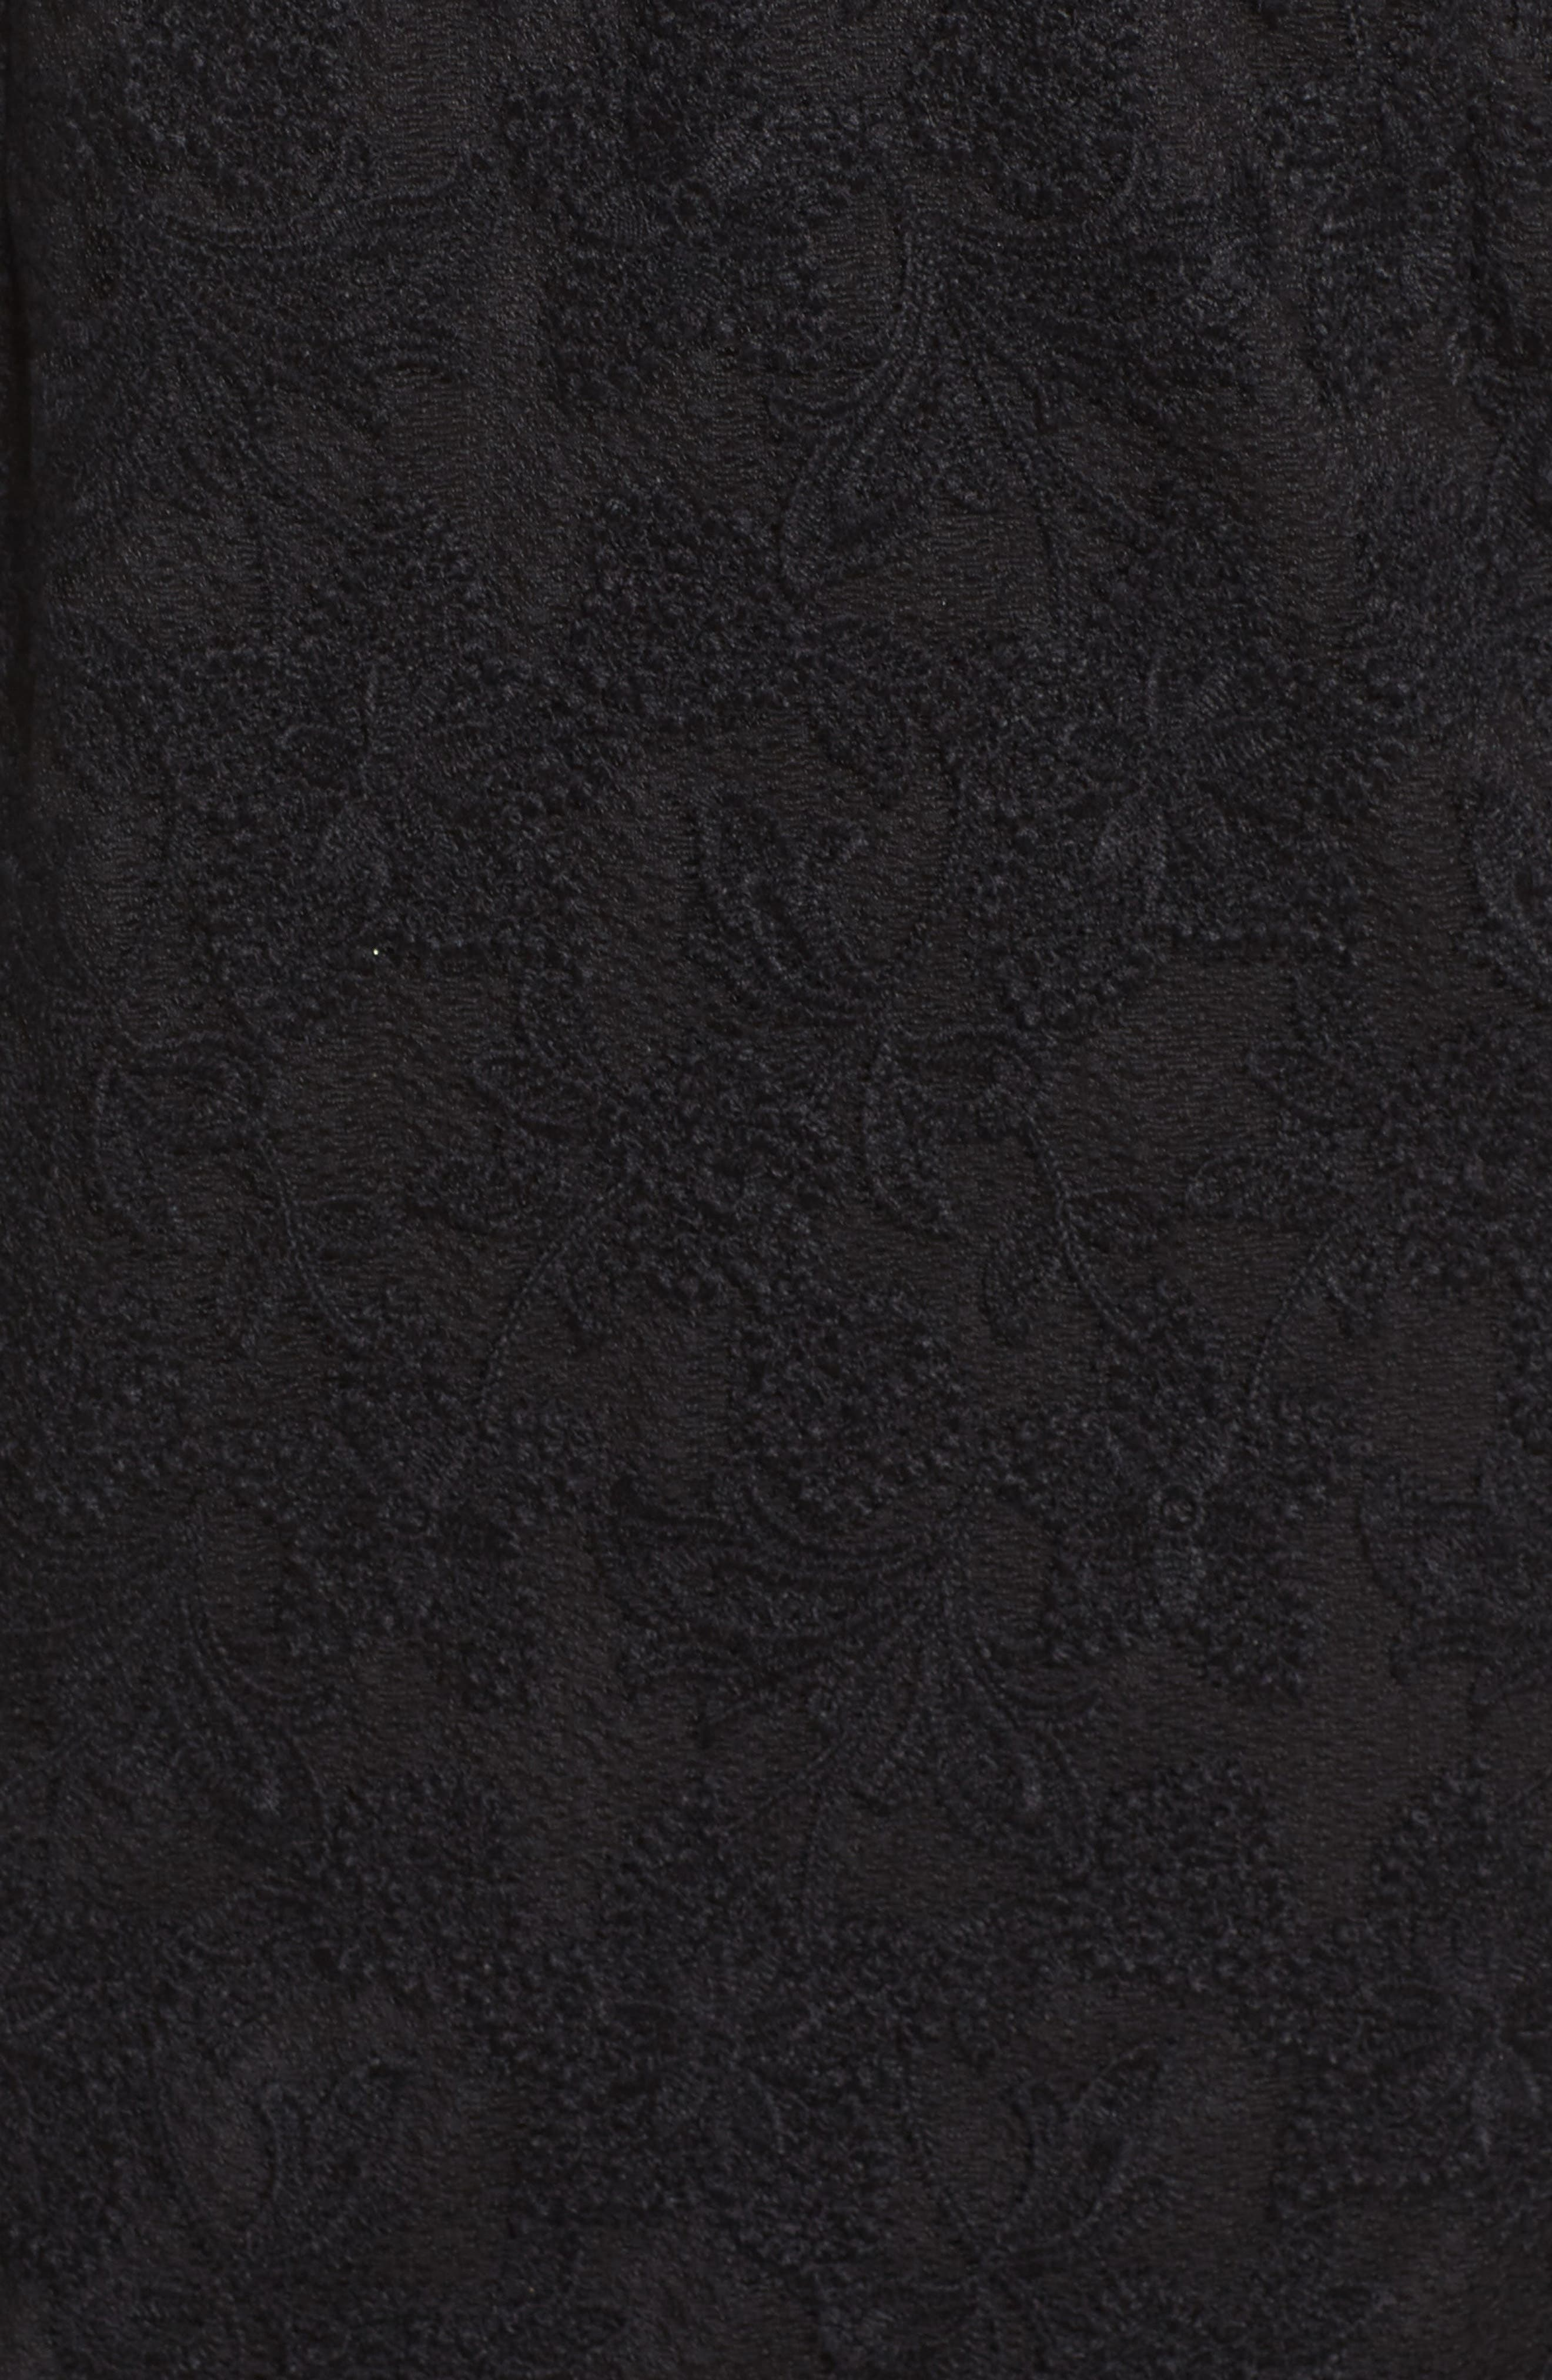 Salmone Lace Sheath Dress,                             Alternate thumbnail 5, color,                             010